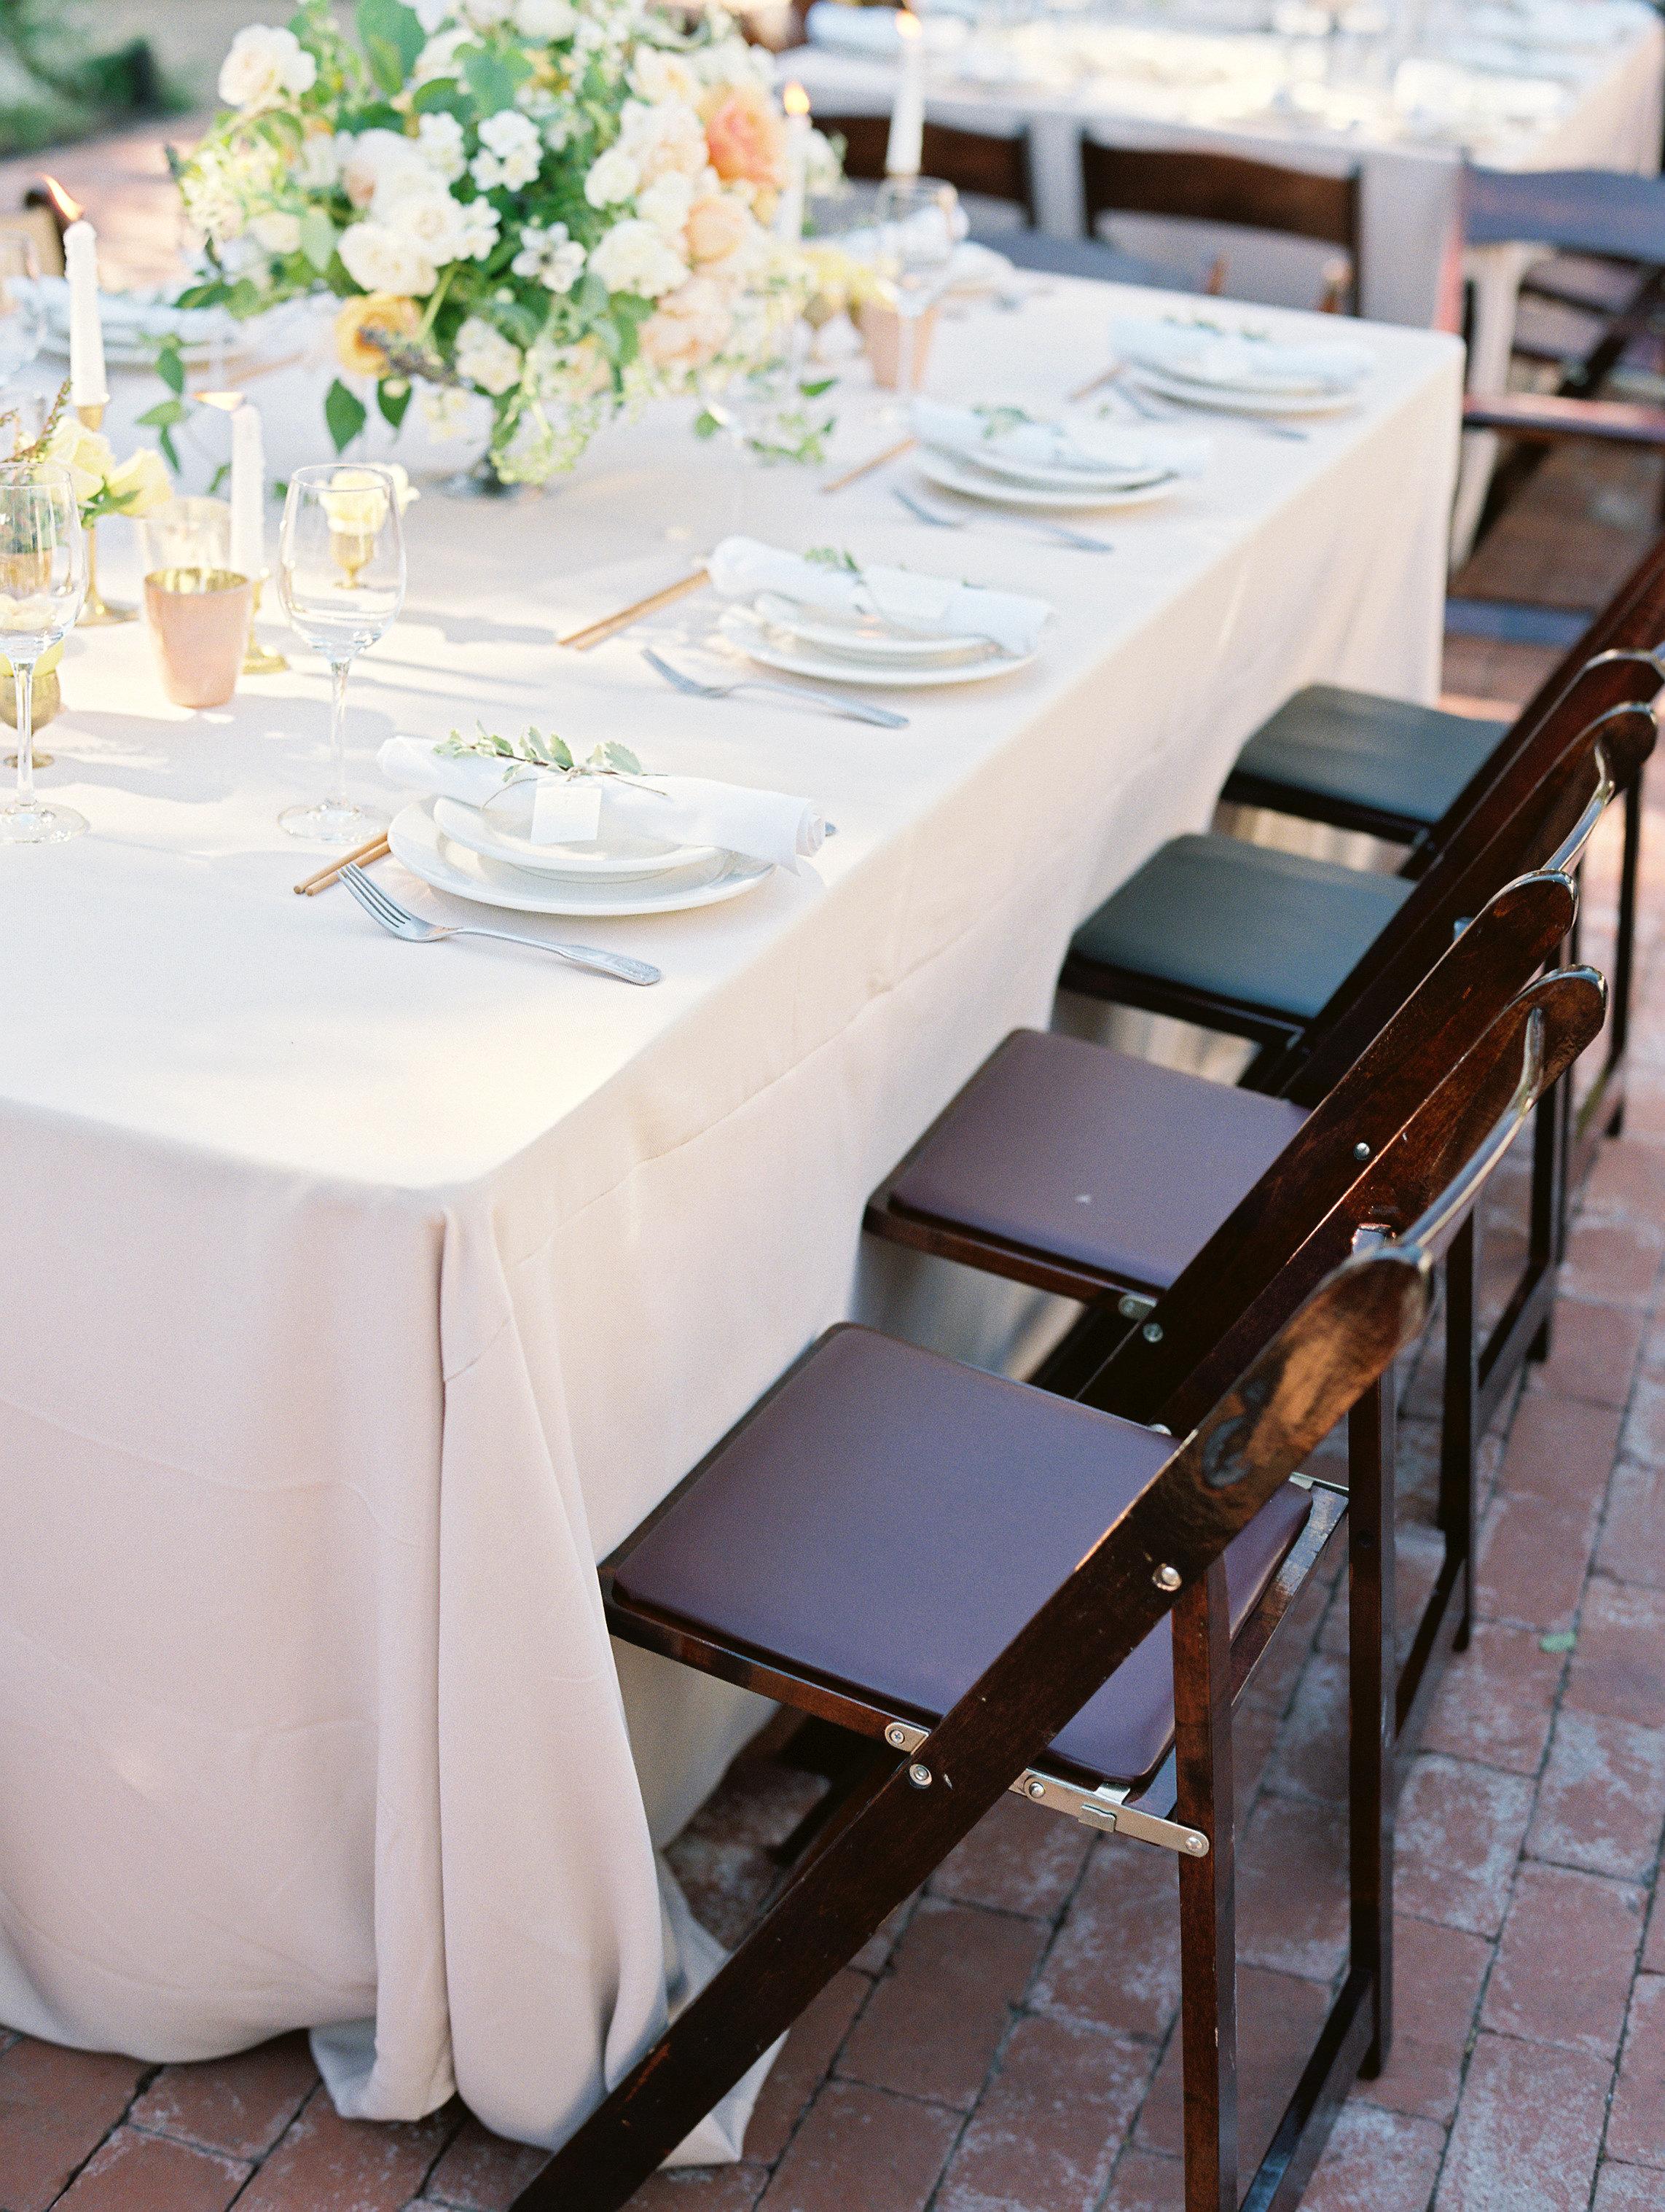 plus suncoast chairs florida each beach blue bamboo tax weddings ice weddingssuncoast wedding chair